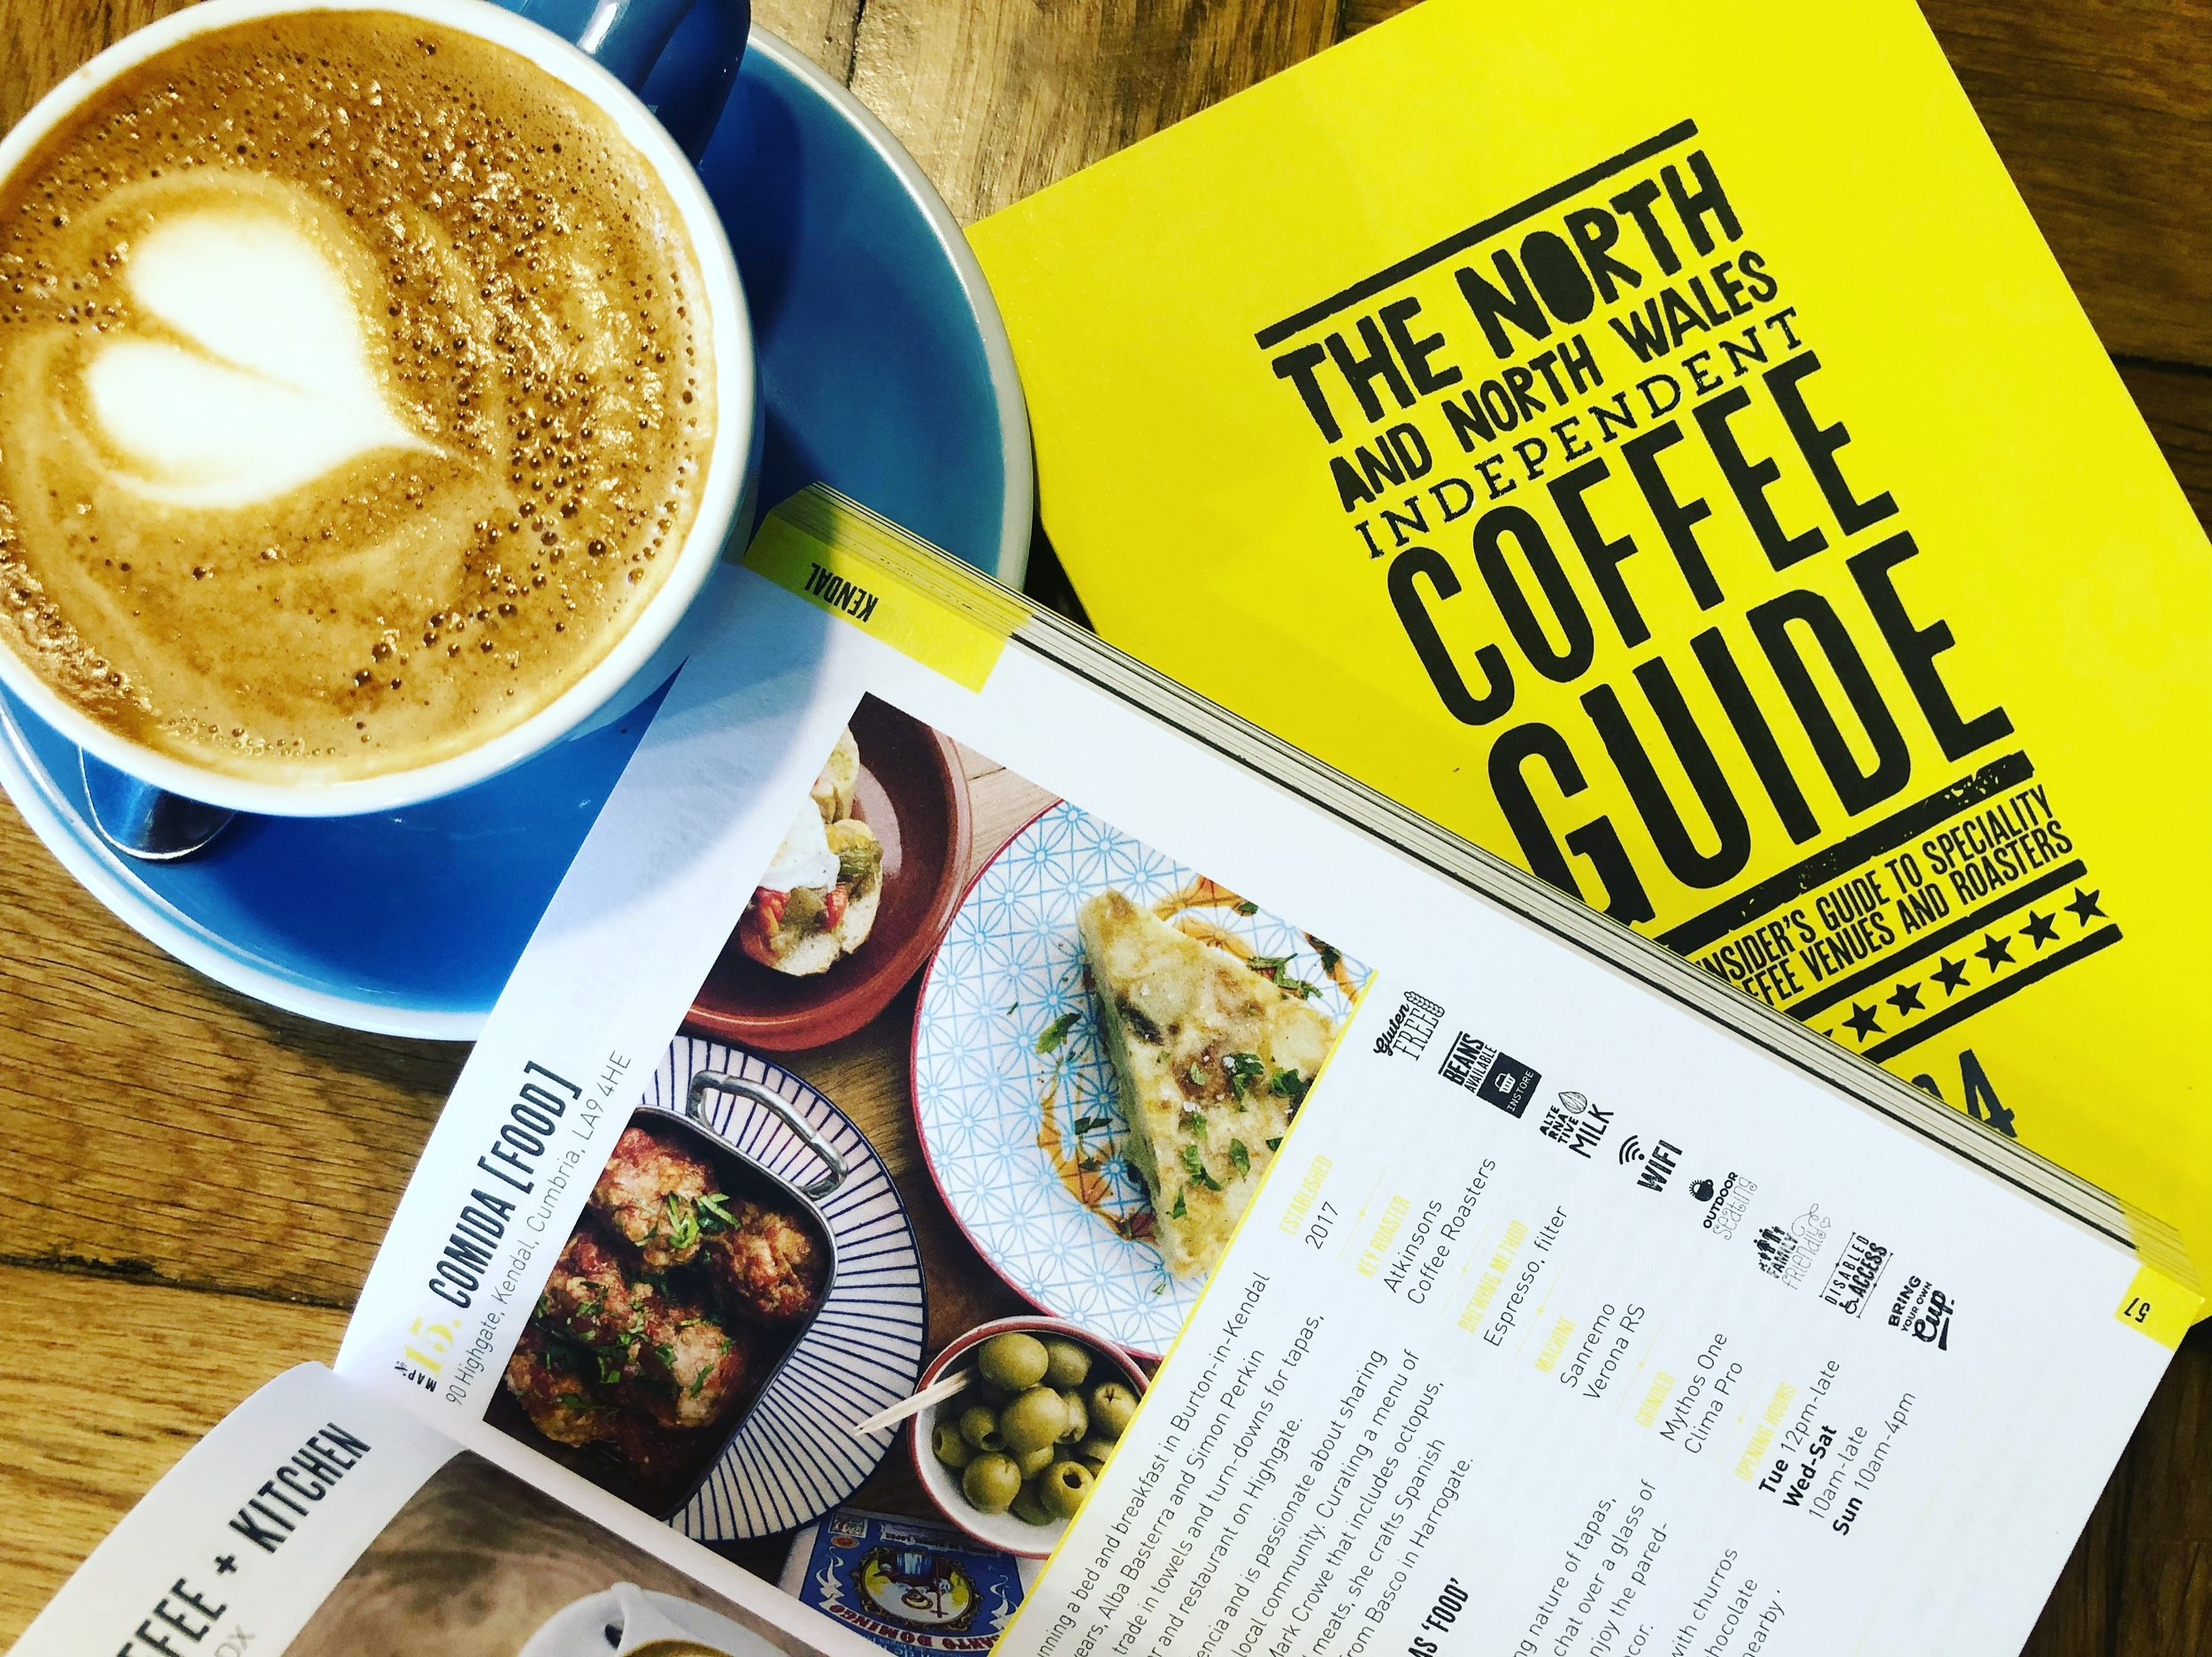 Atkinsons speciality coffee & tea -